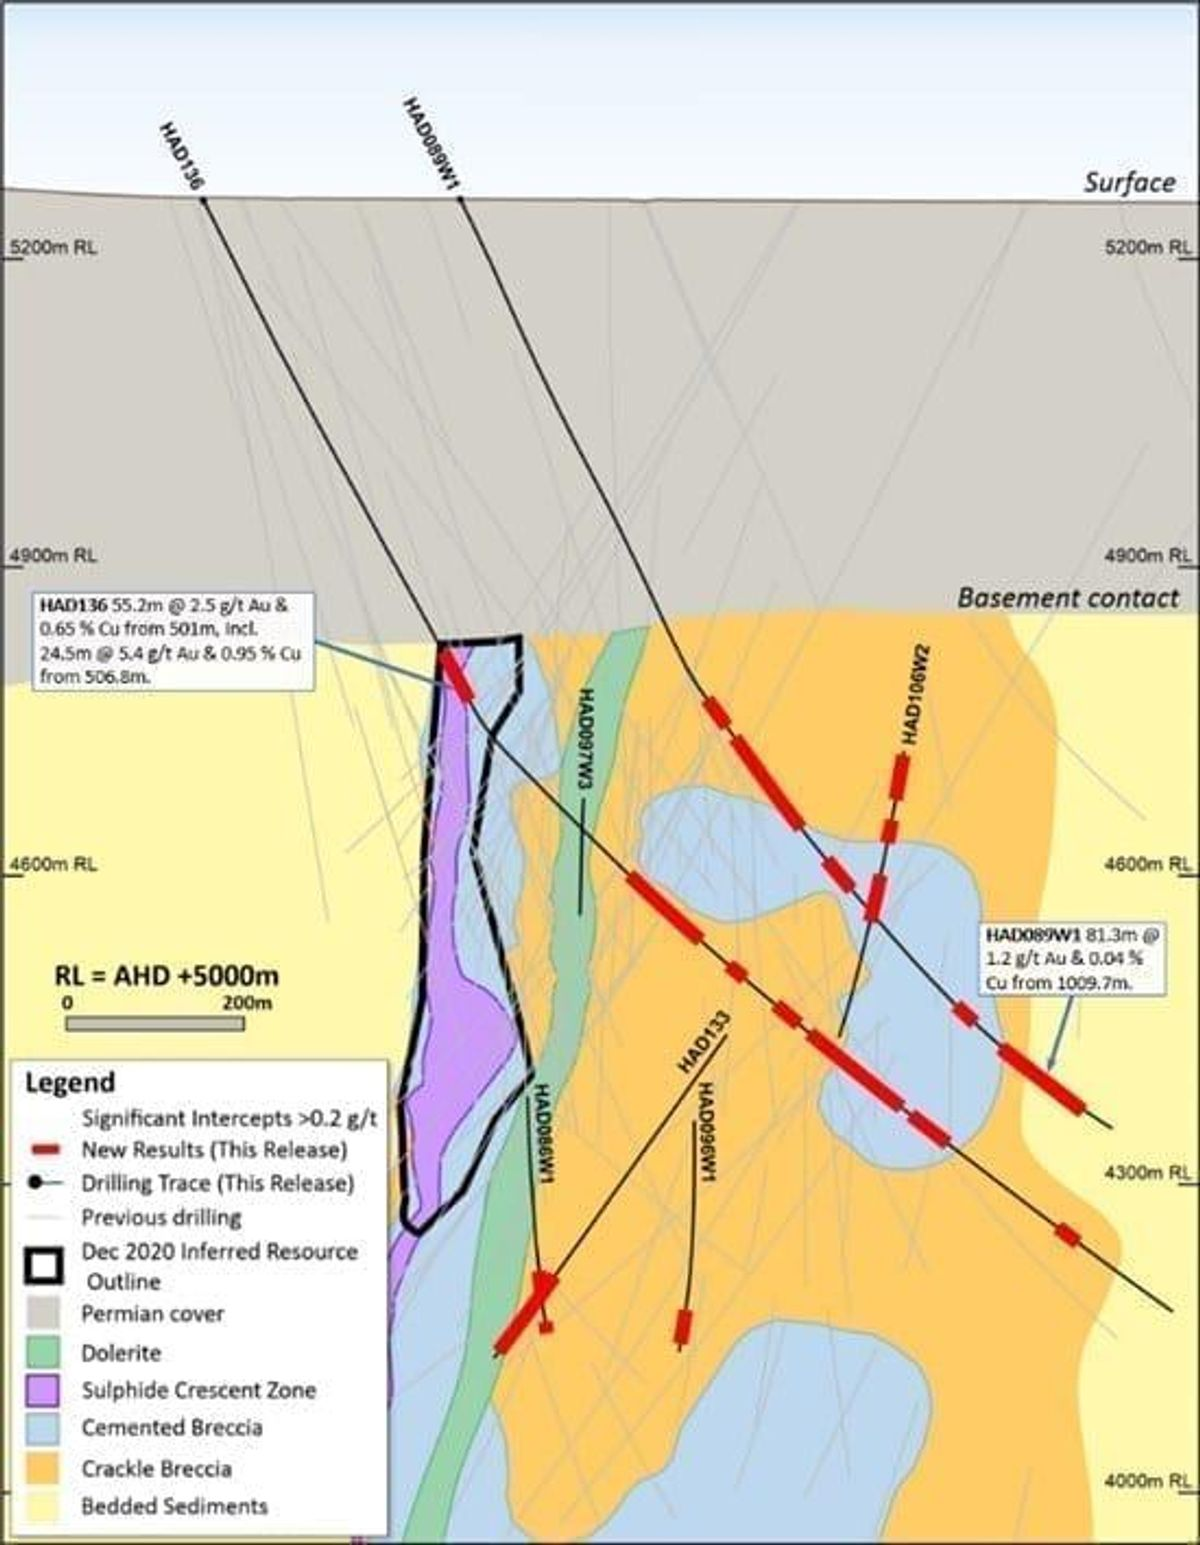 Newcrest Mining Limited – Exploration Update 10 June 2021